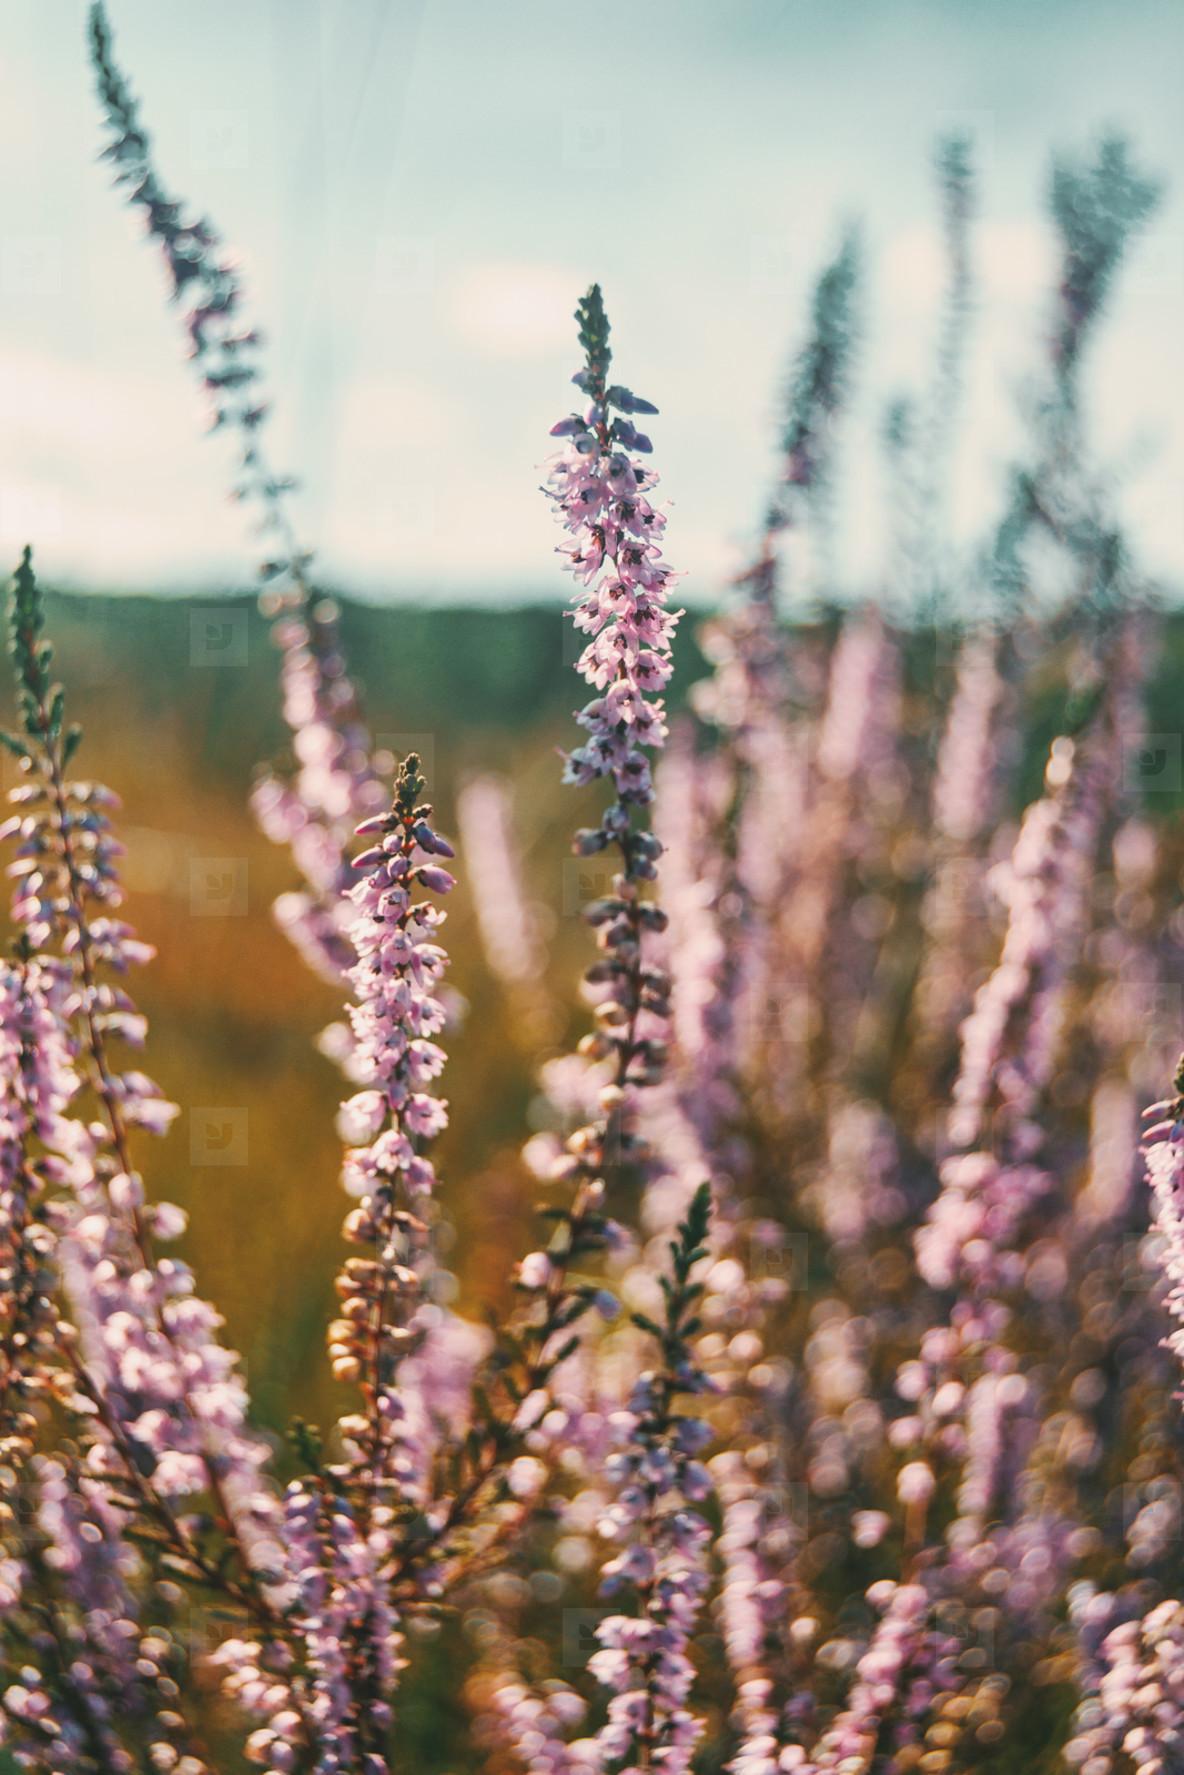 pink flowers of calluna vulgaris in a field